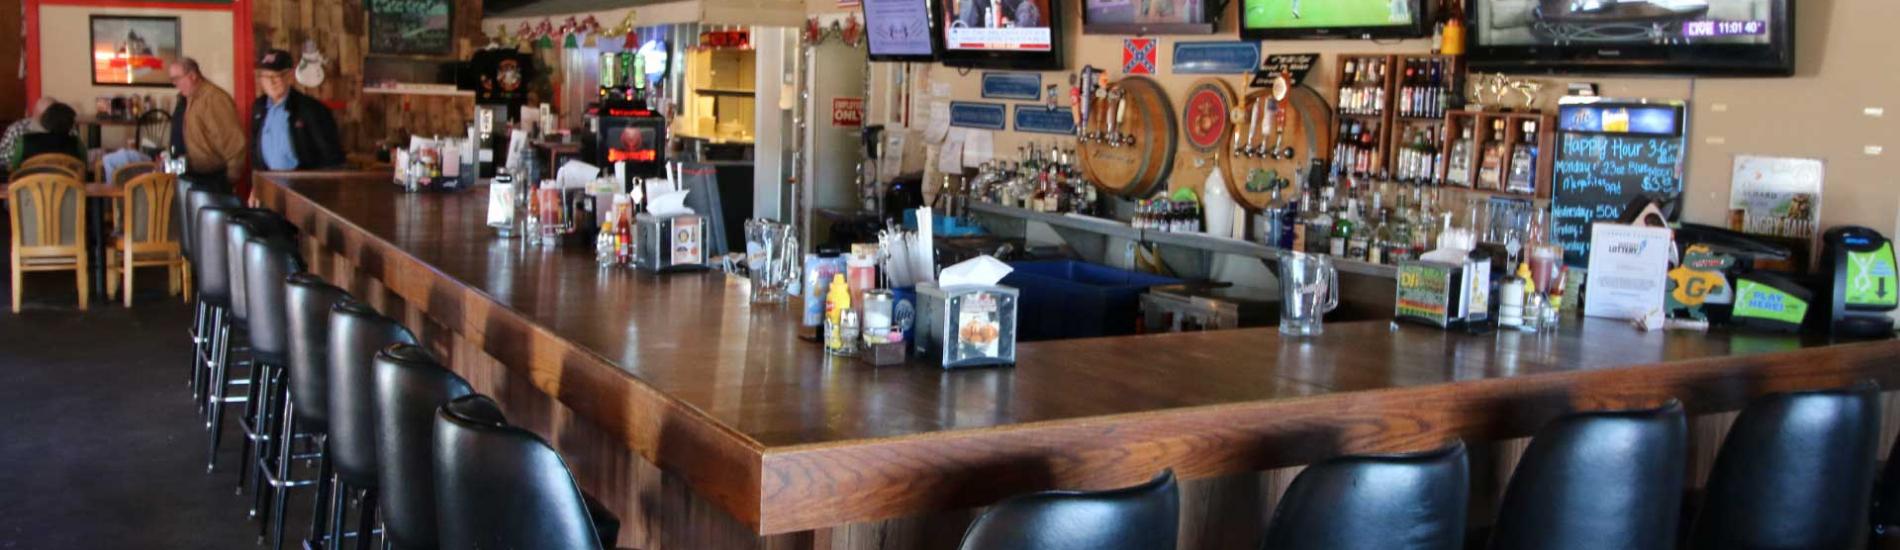 full-service-bar-bowling-green-1